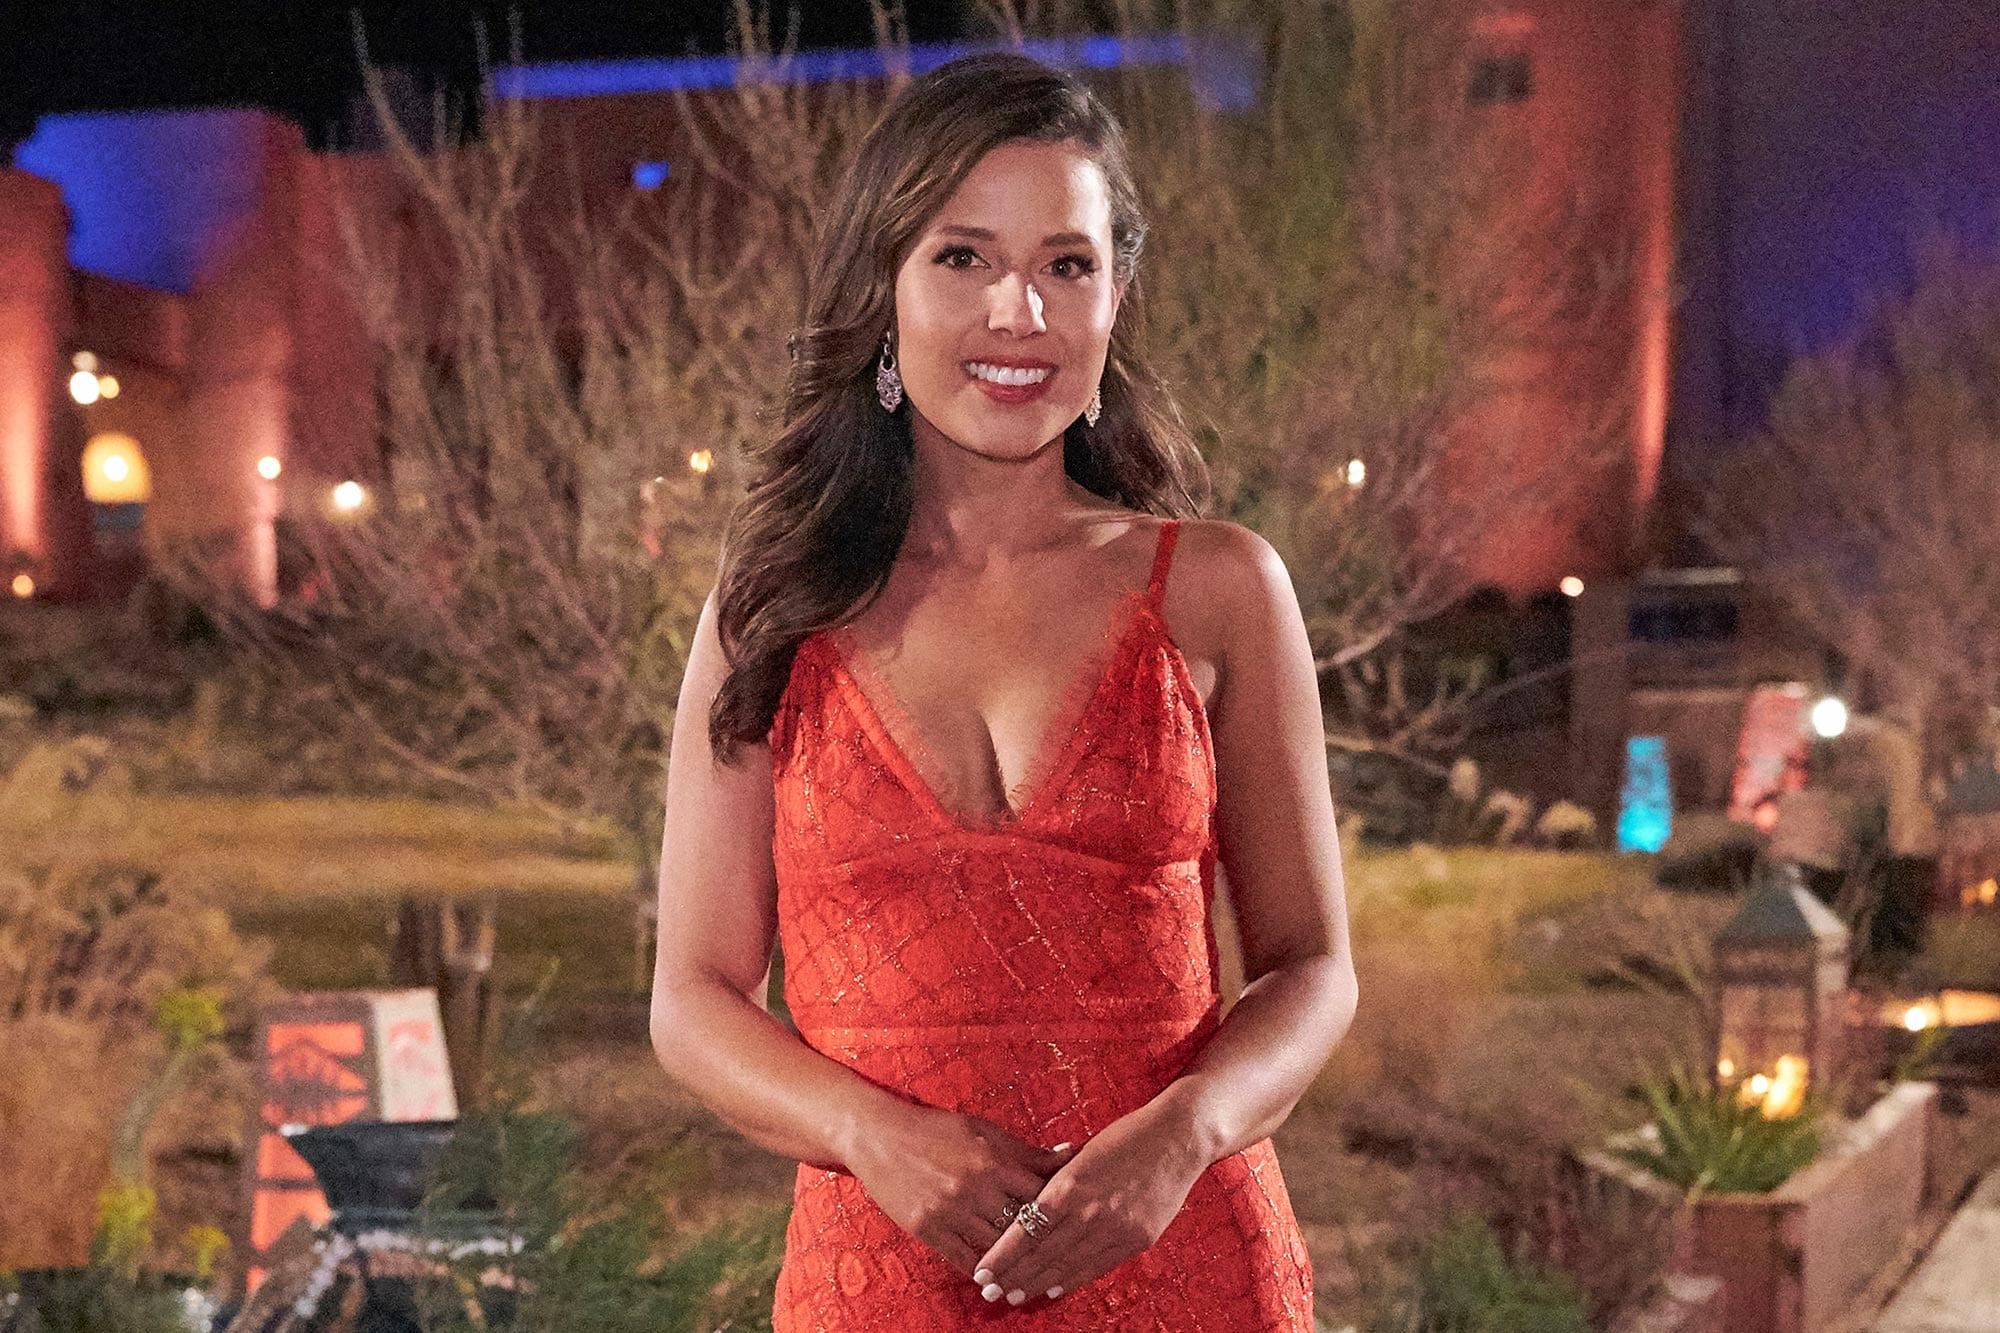 Preview: The Bachelorette Season 17 Episode 4